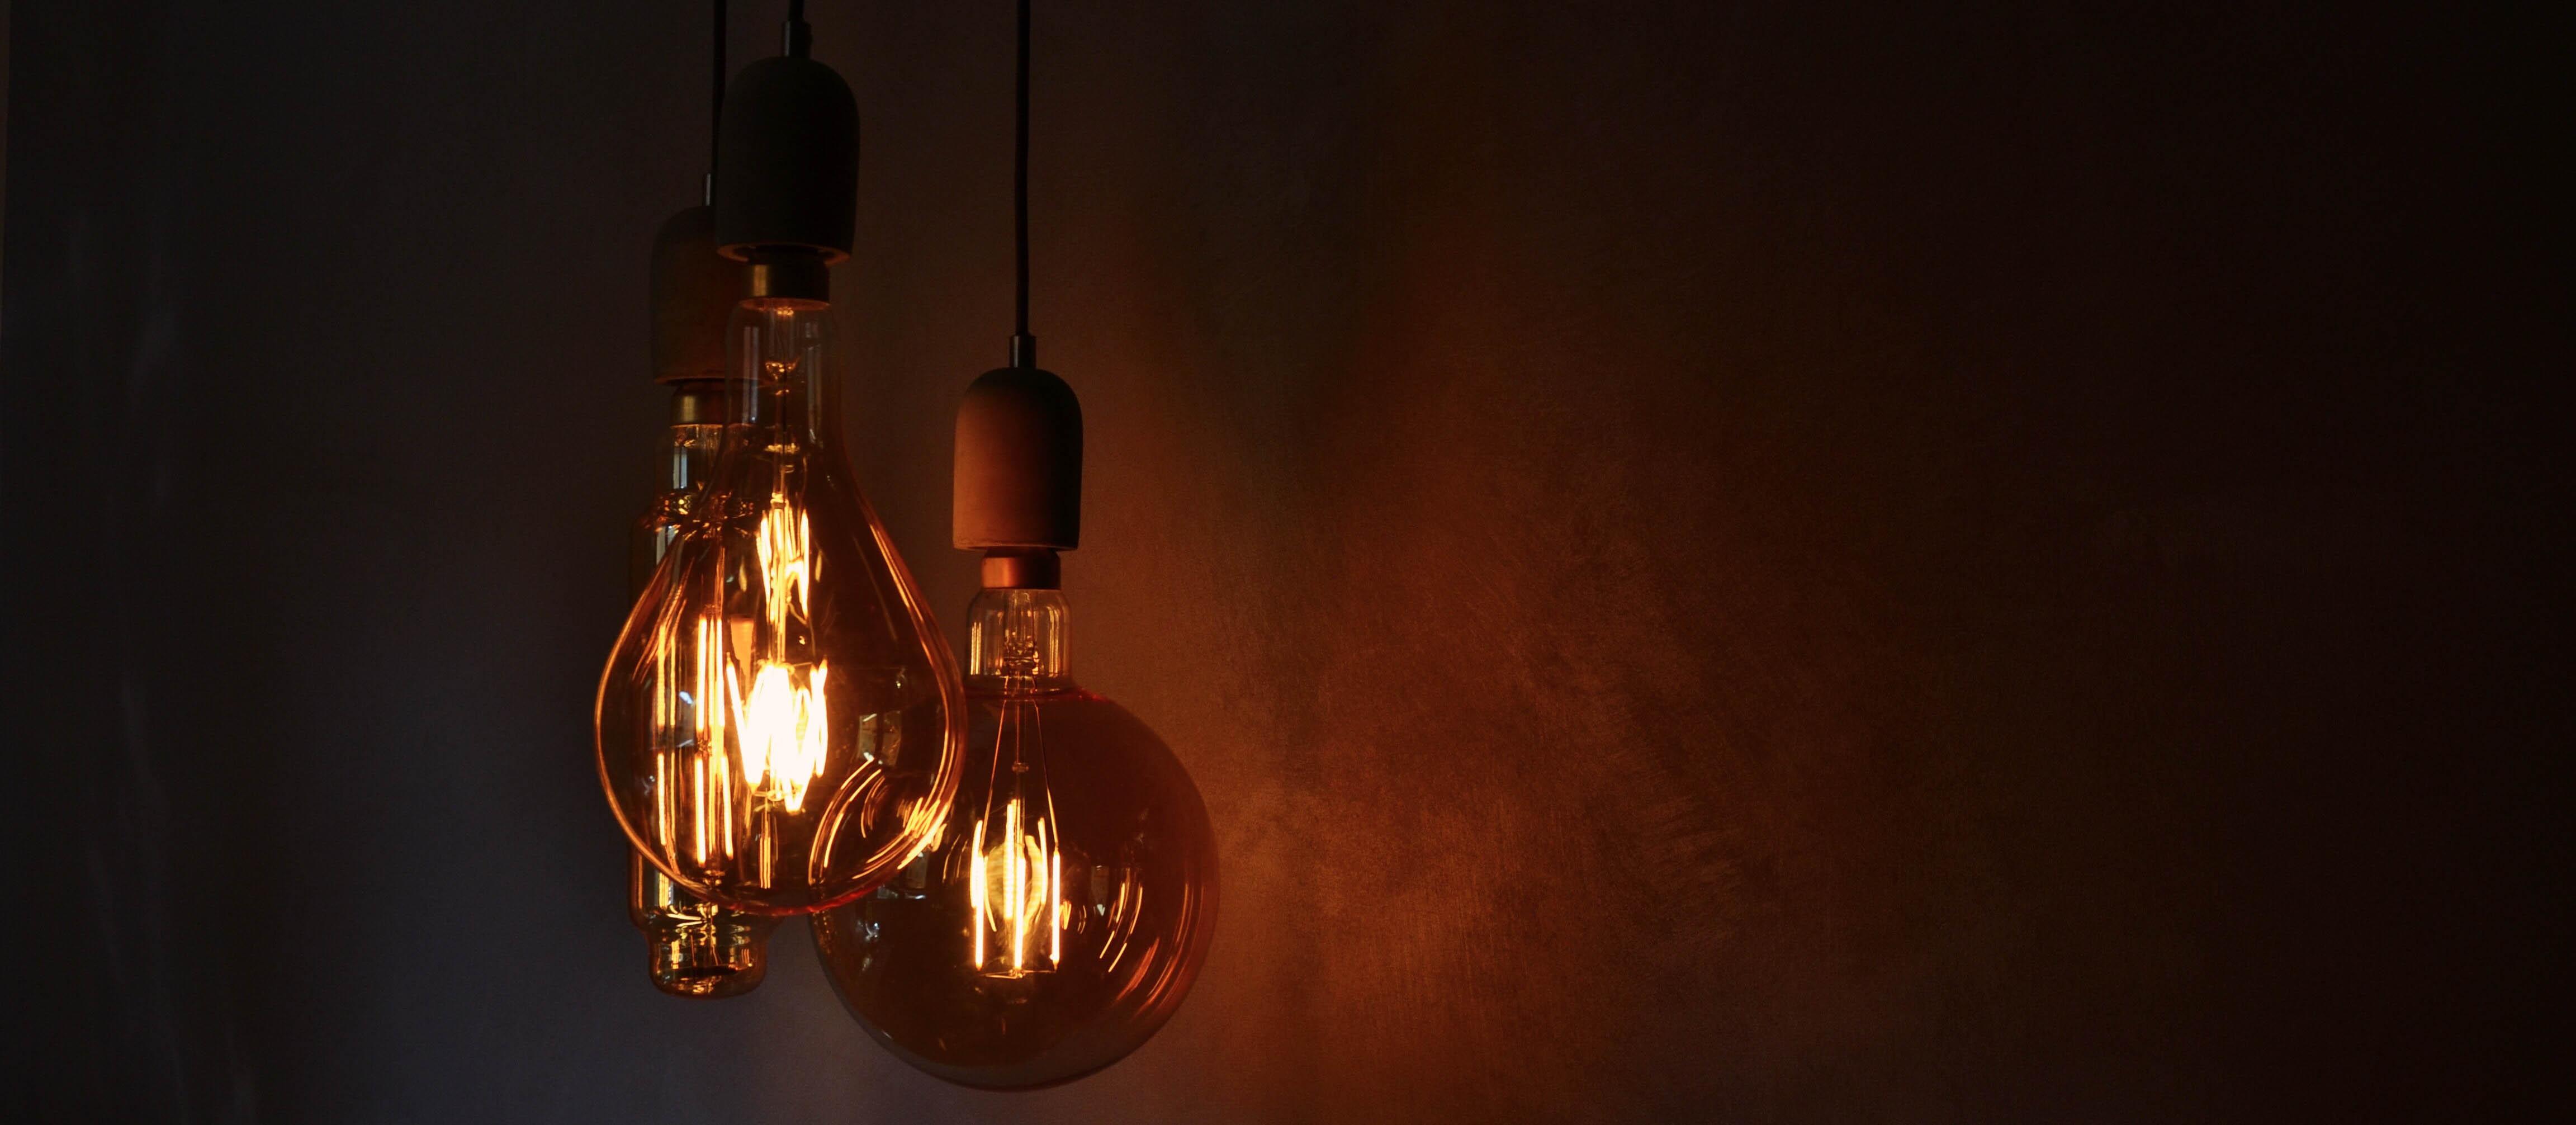 Unsplash/Federica Giusti glass light bulb